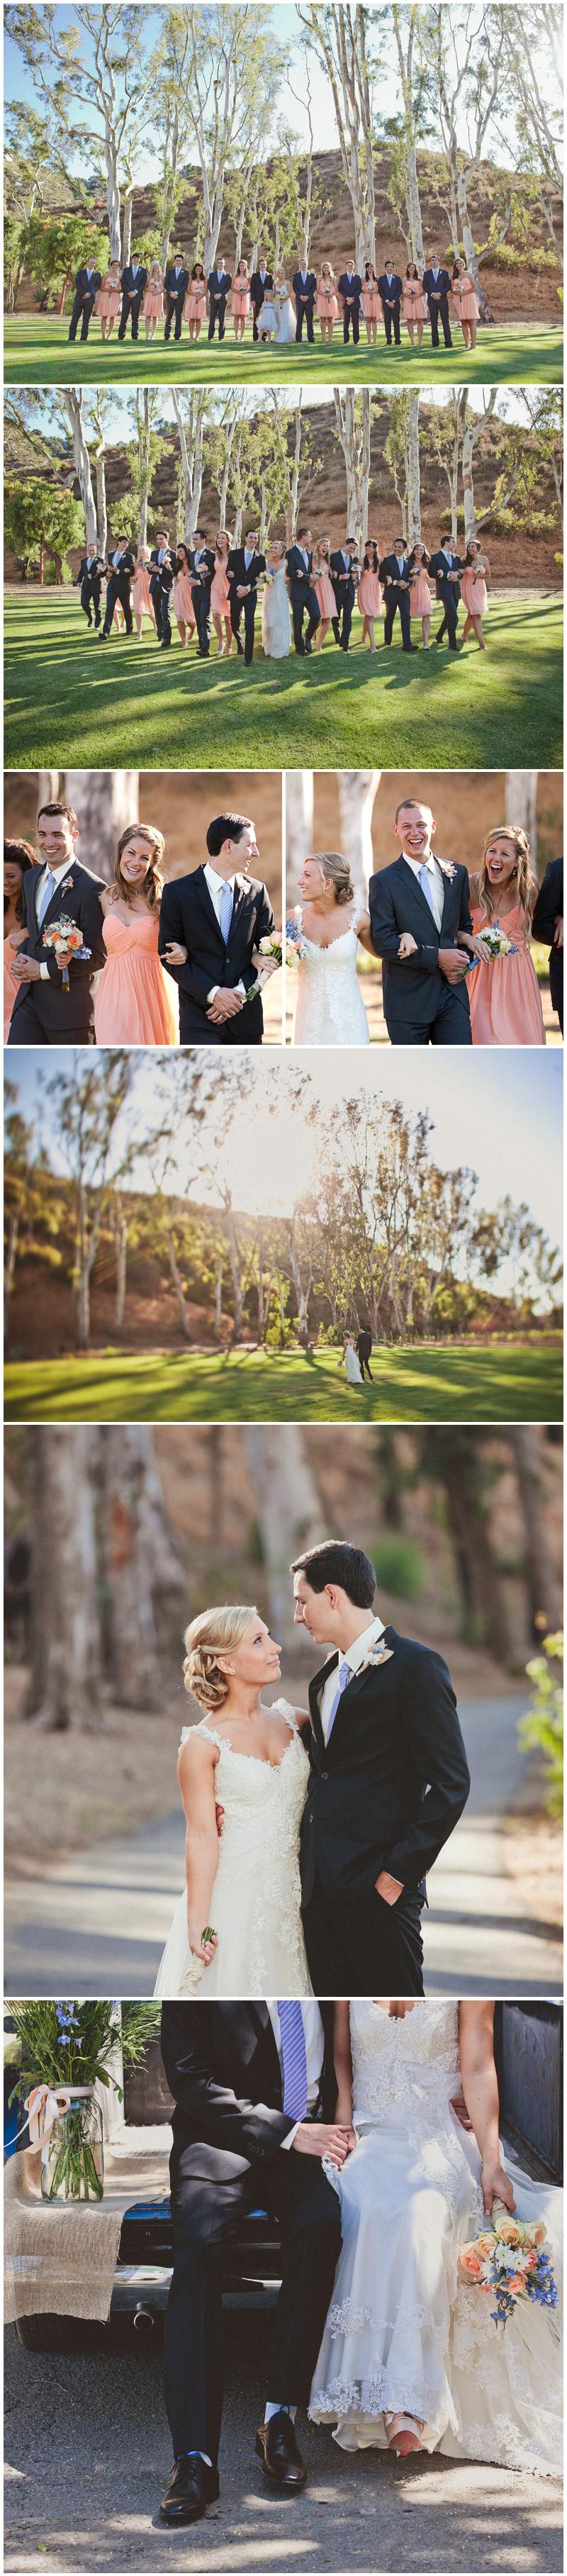 bandy canyon ranch wedding